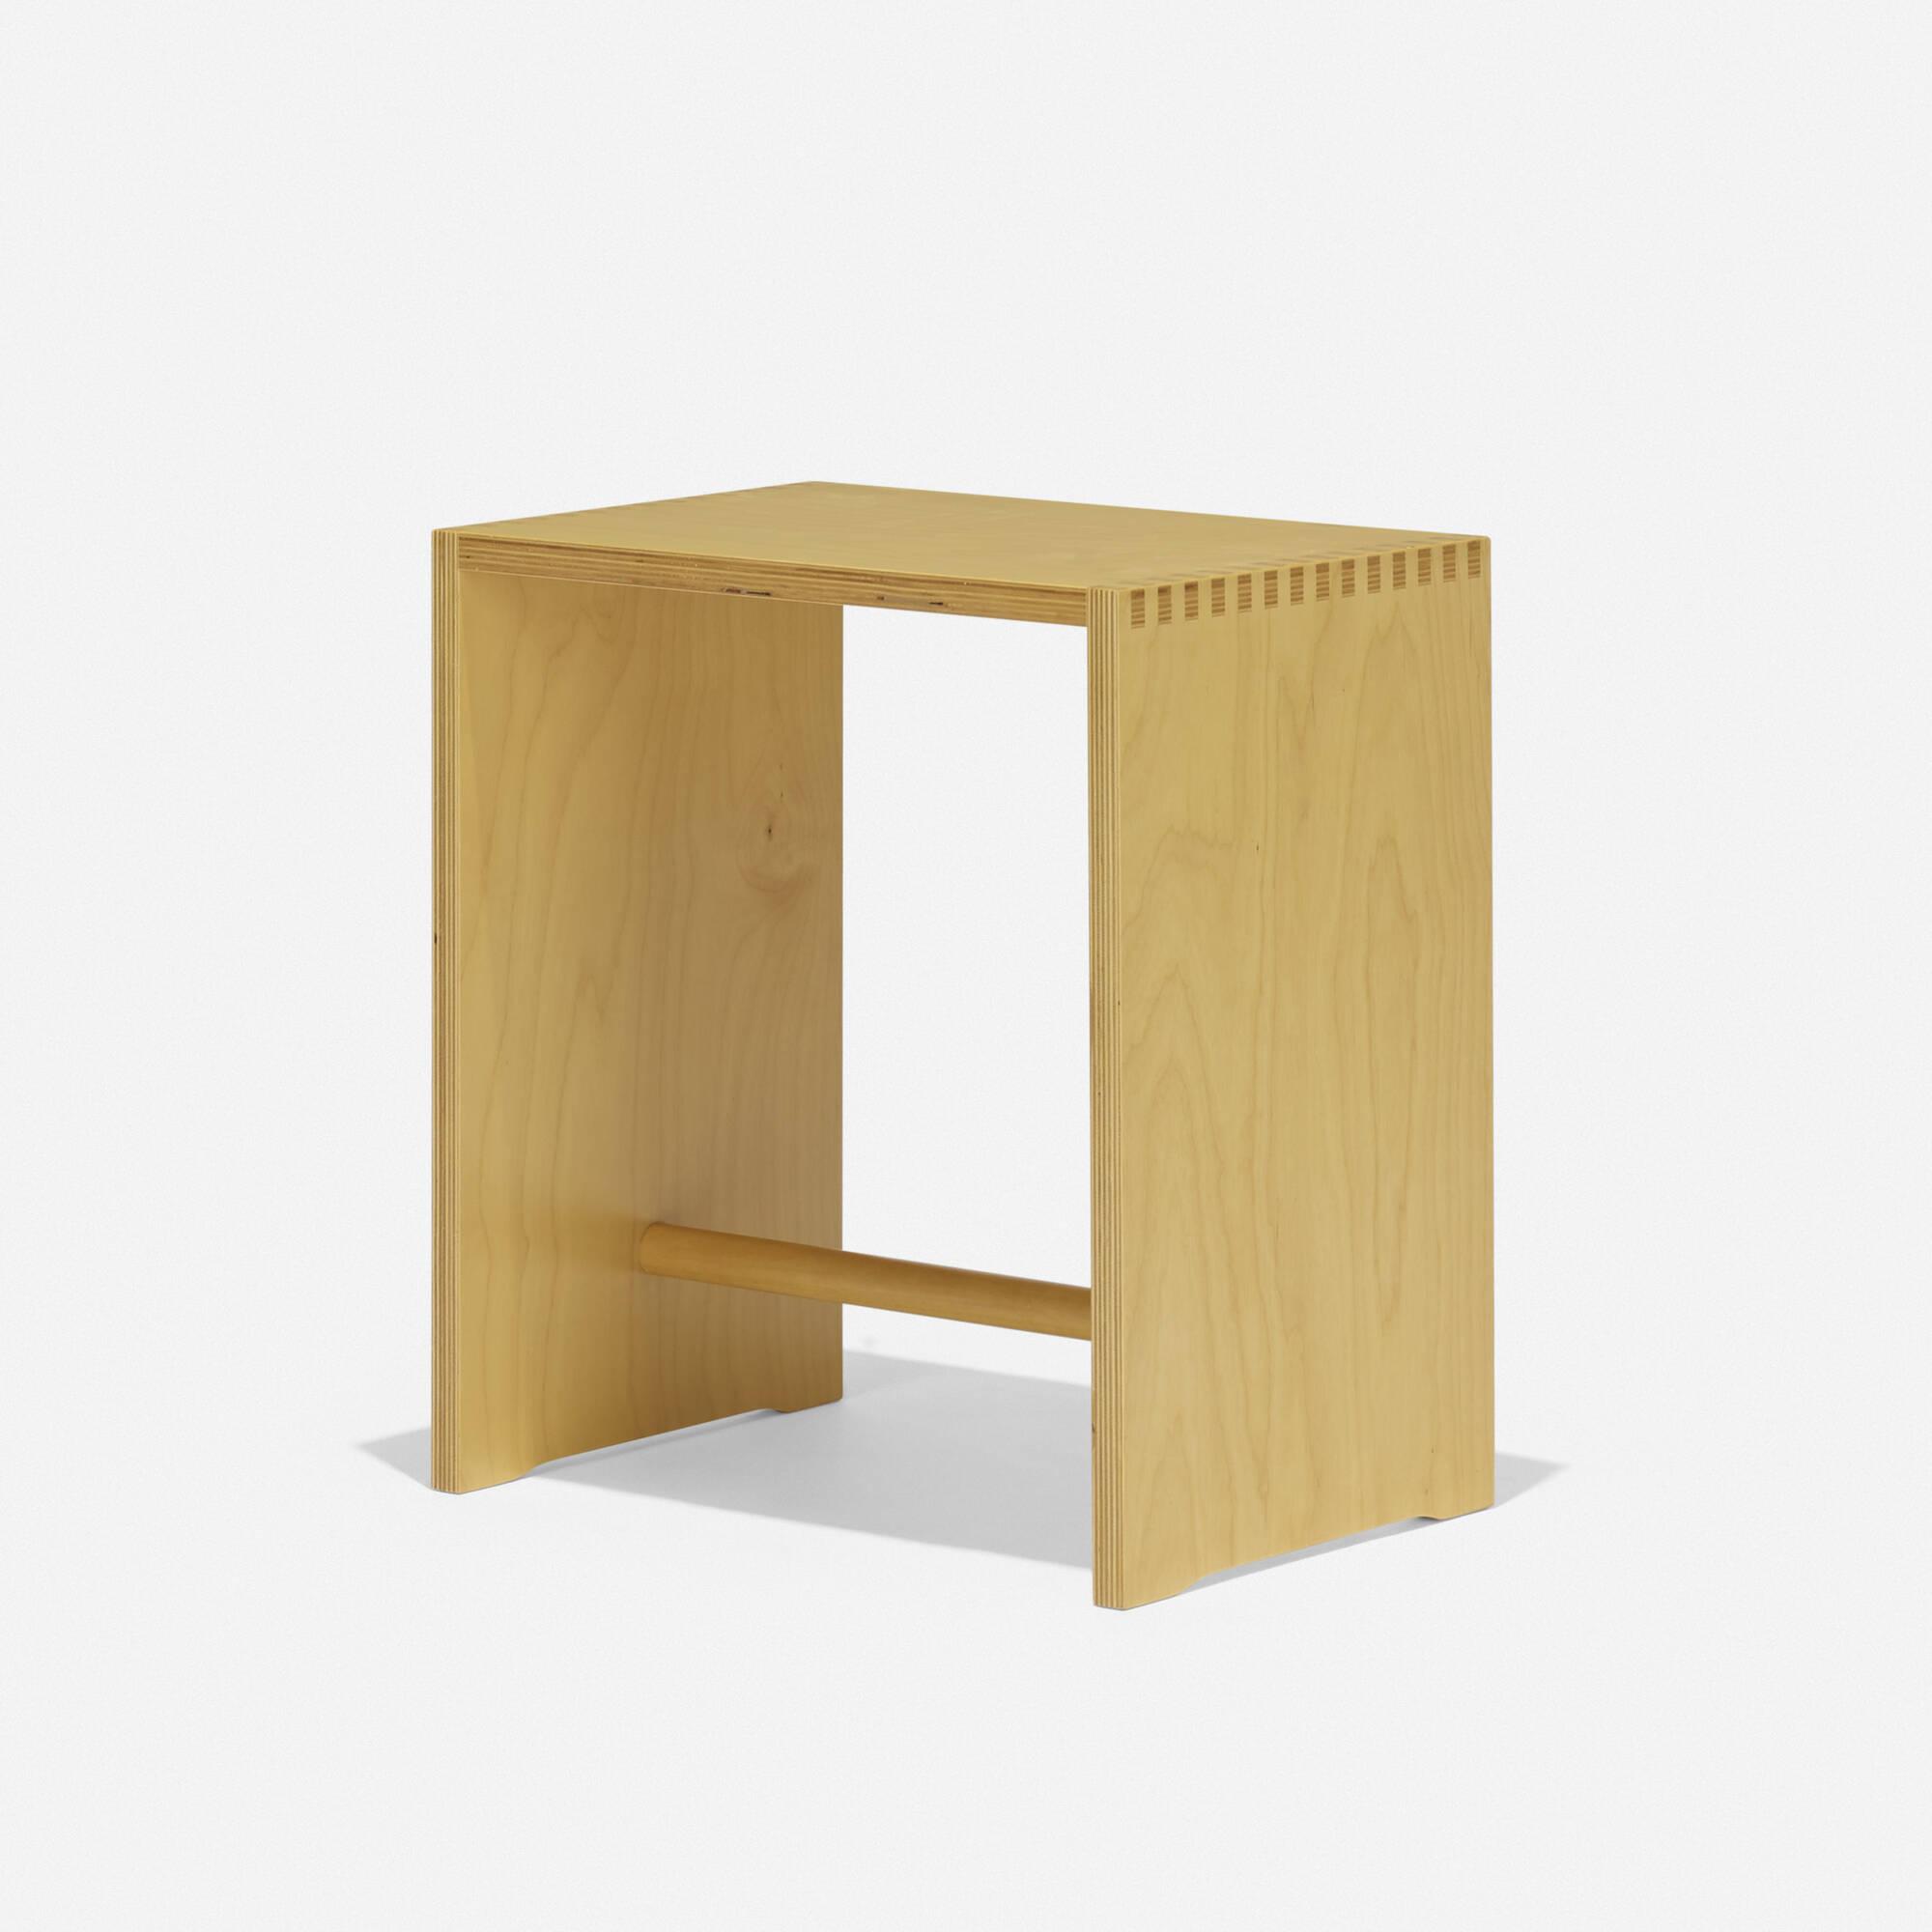 101: Max Bill / Sgabillo stool (1 of 3)